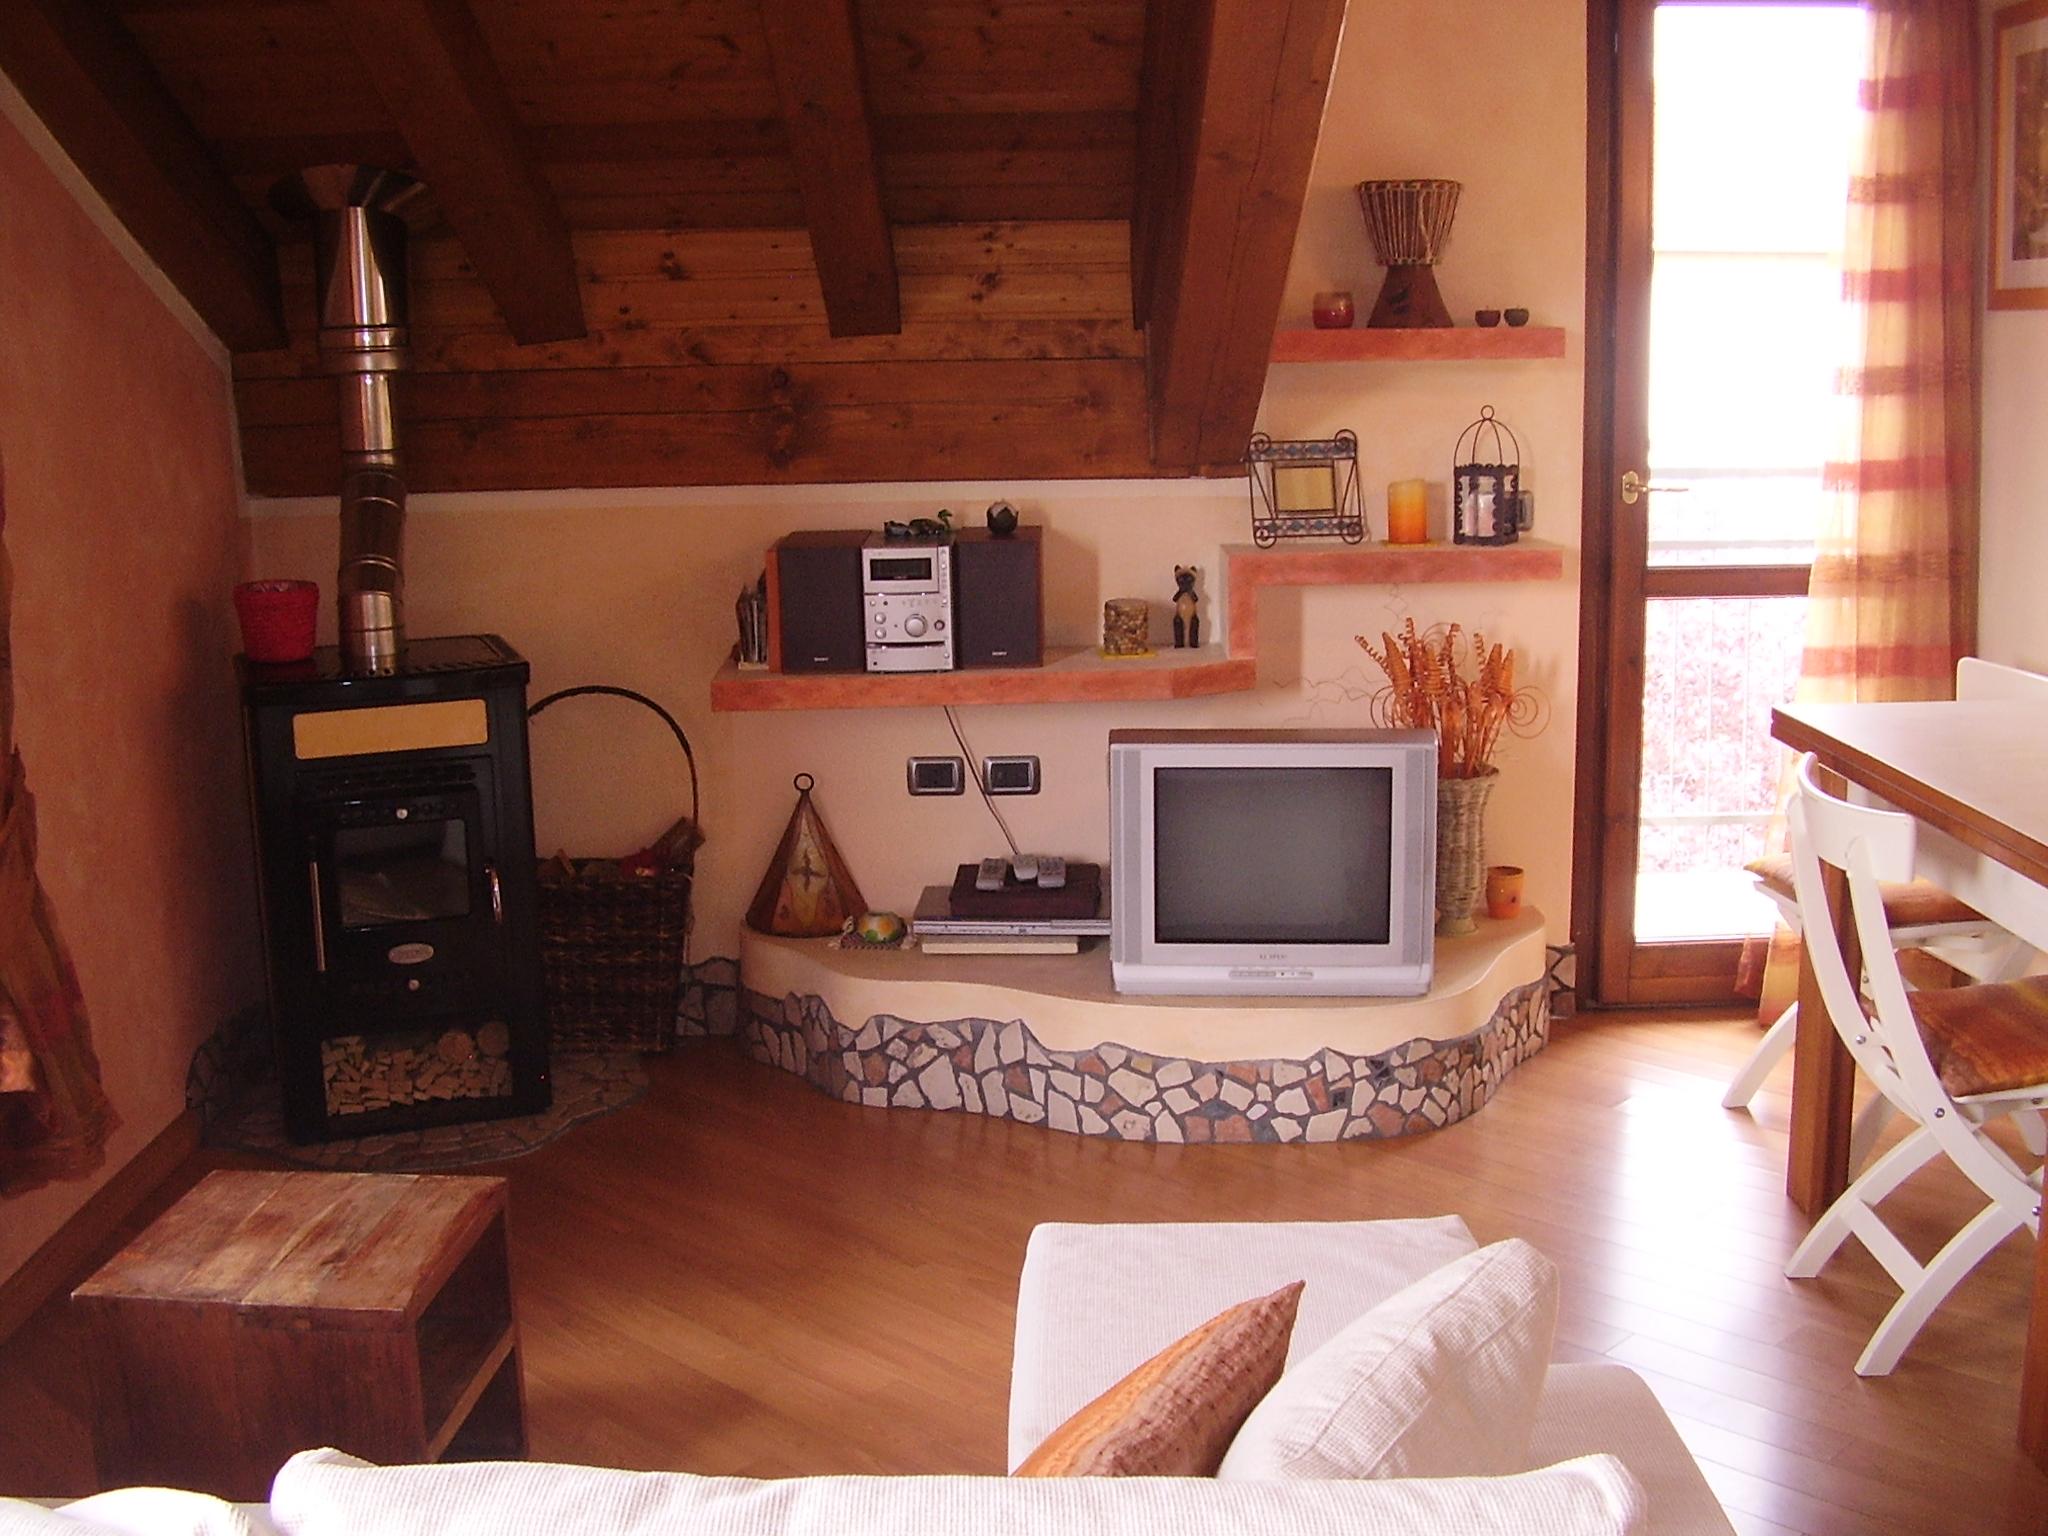 Venta 1 Habitación, Dalmine, Bergamo, Italia, Dalmine  italia.realigro.es